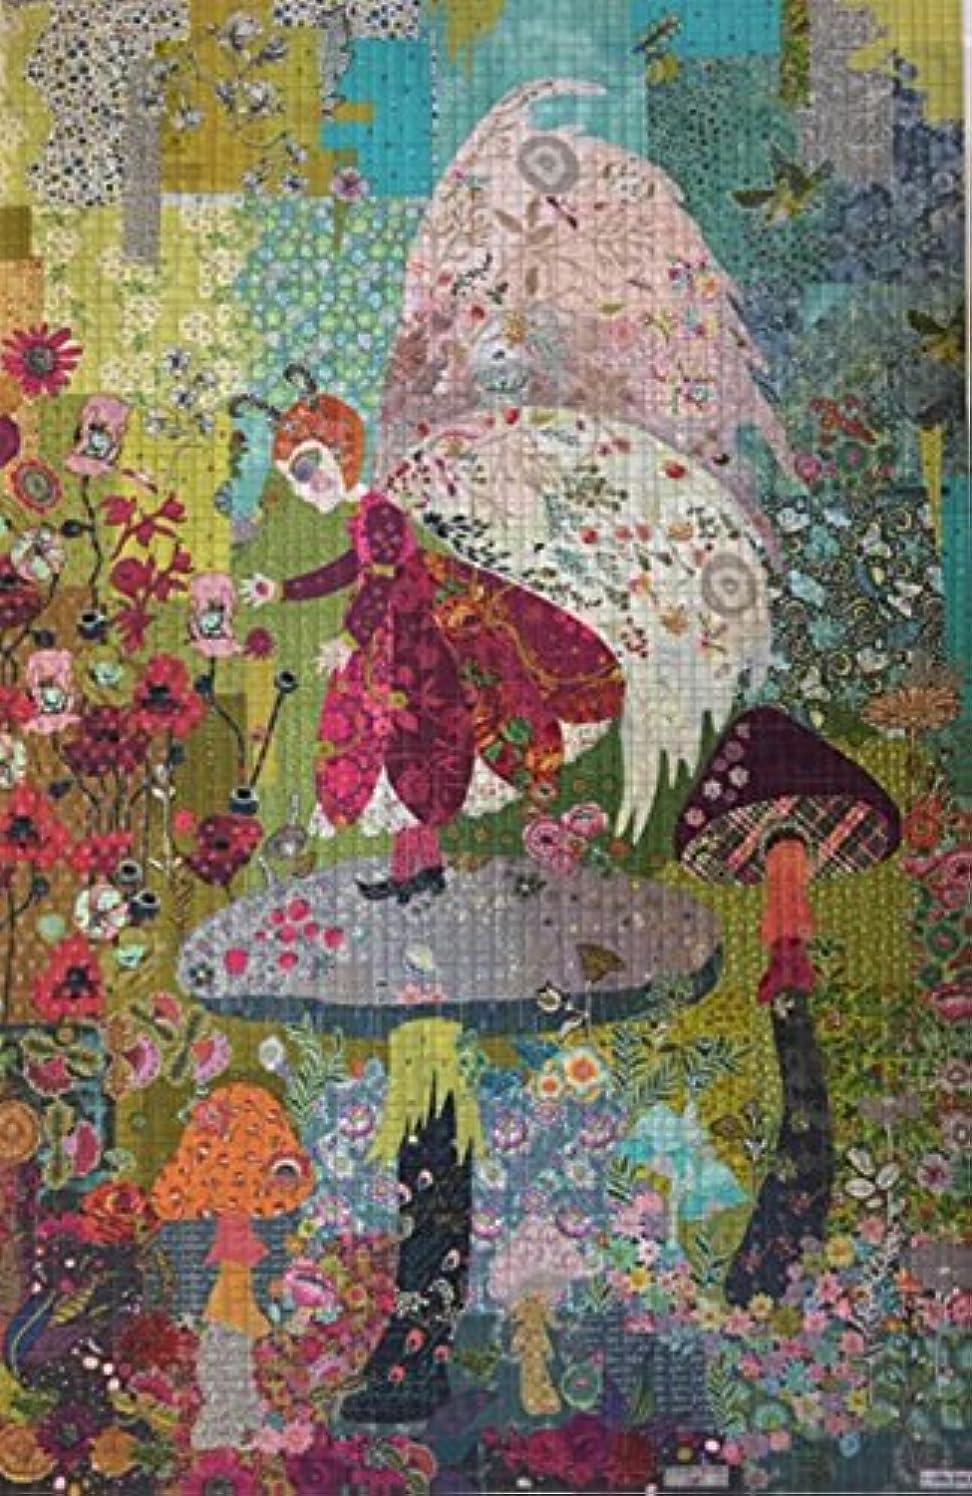 Fiberworks LHFWMEA Meadow Collage Pattern, Finishes 40